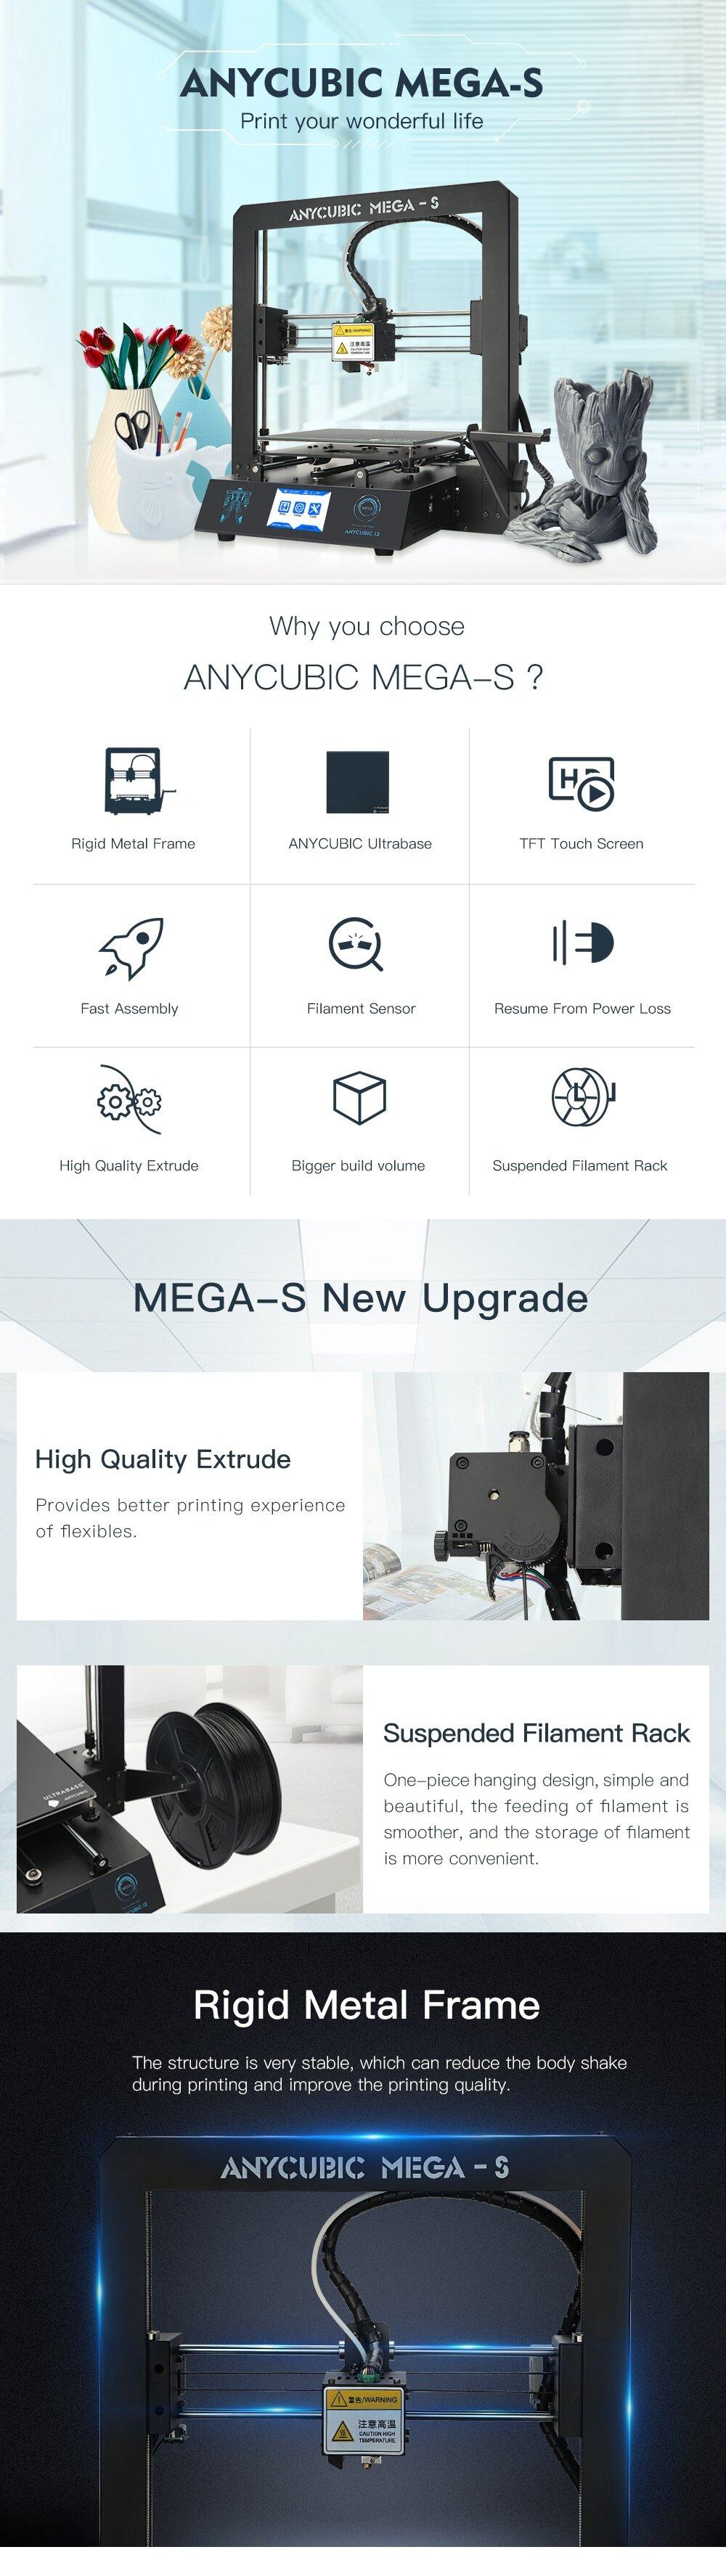 Anycubic i3 Mega-S 3D Printer